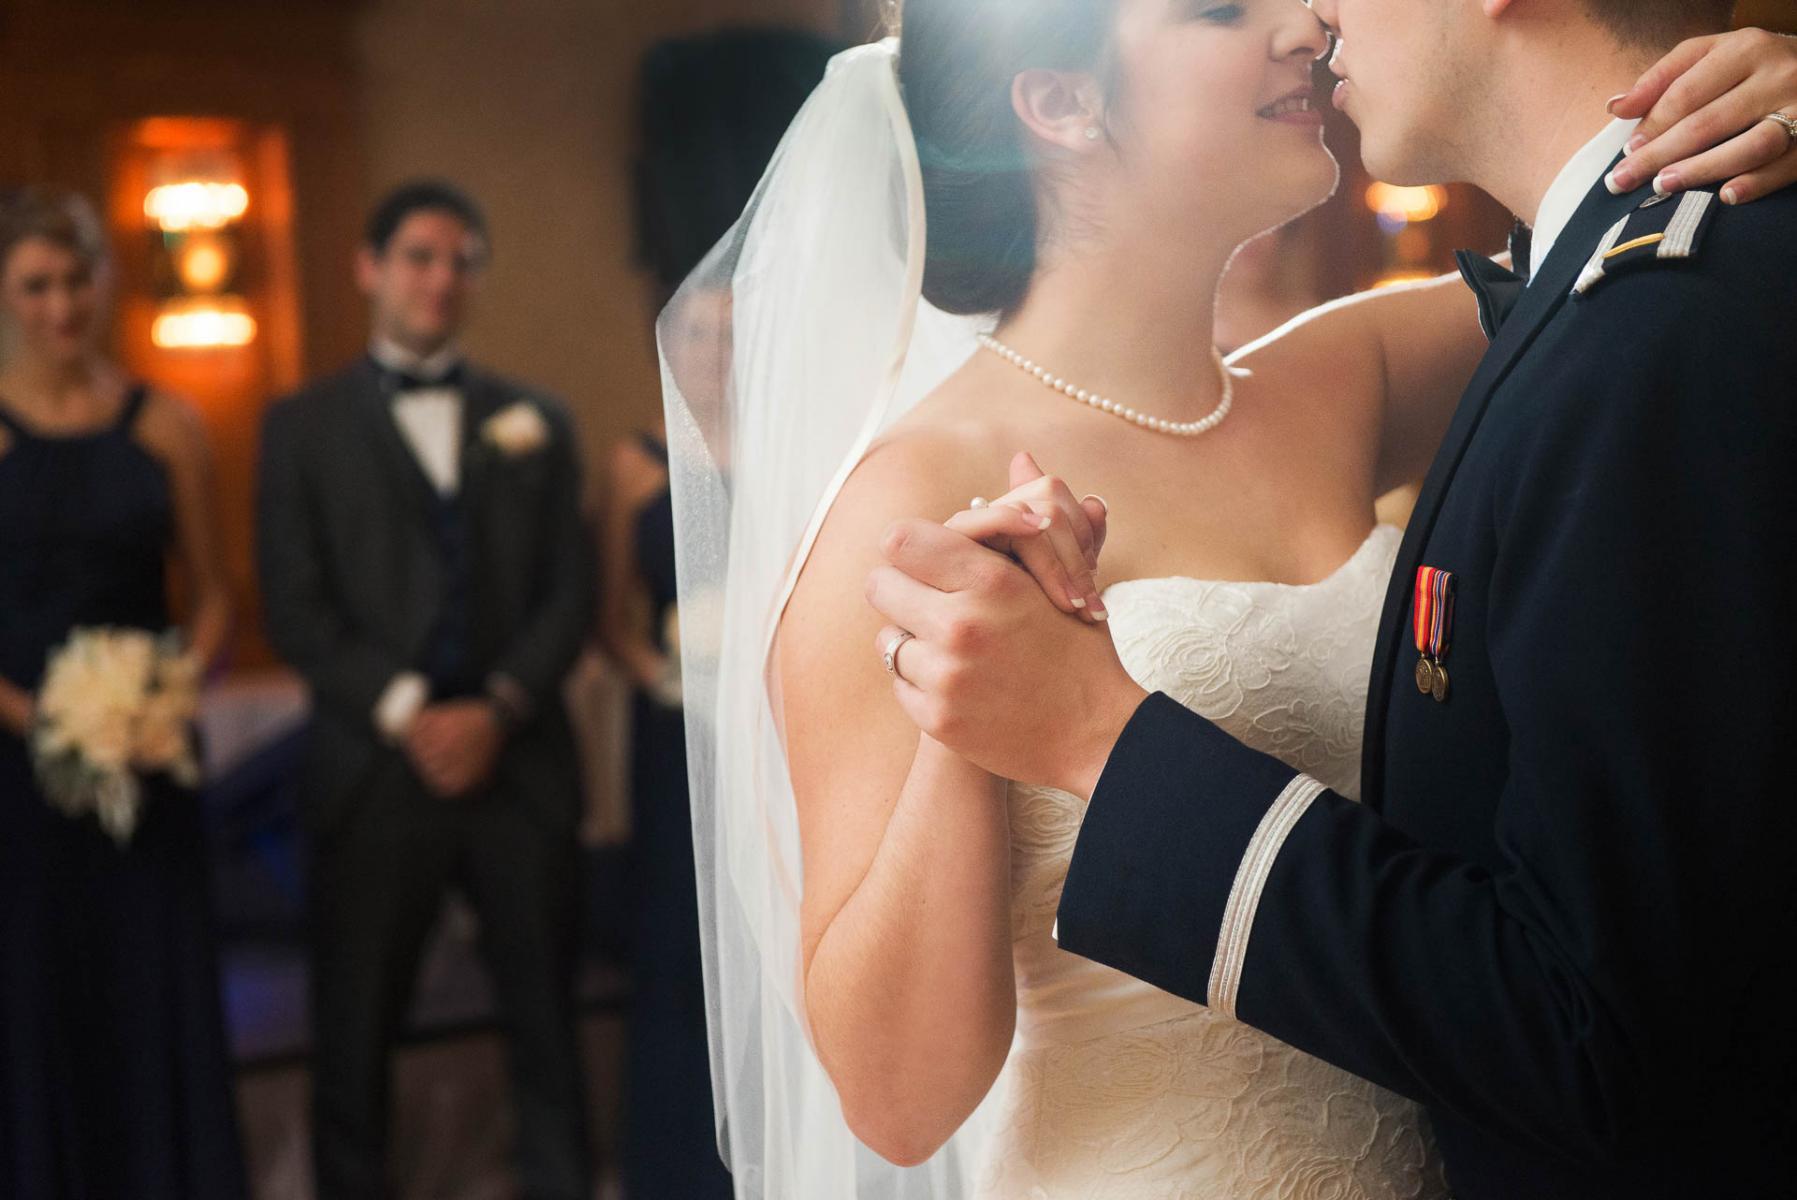 Kara givnish wedding